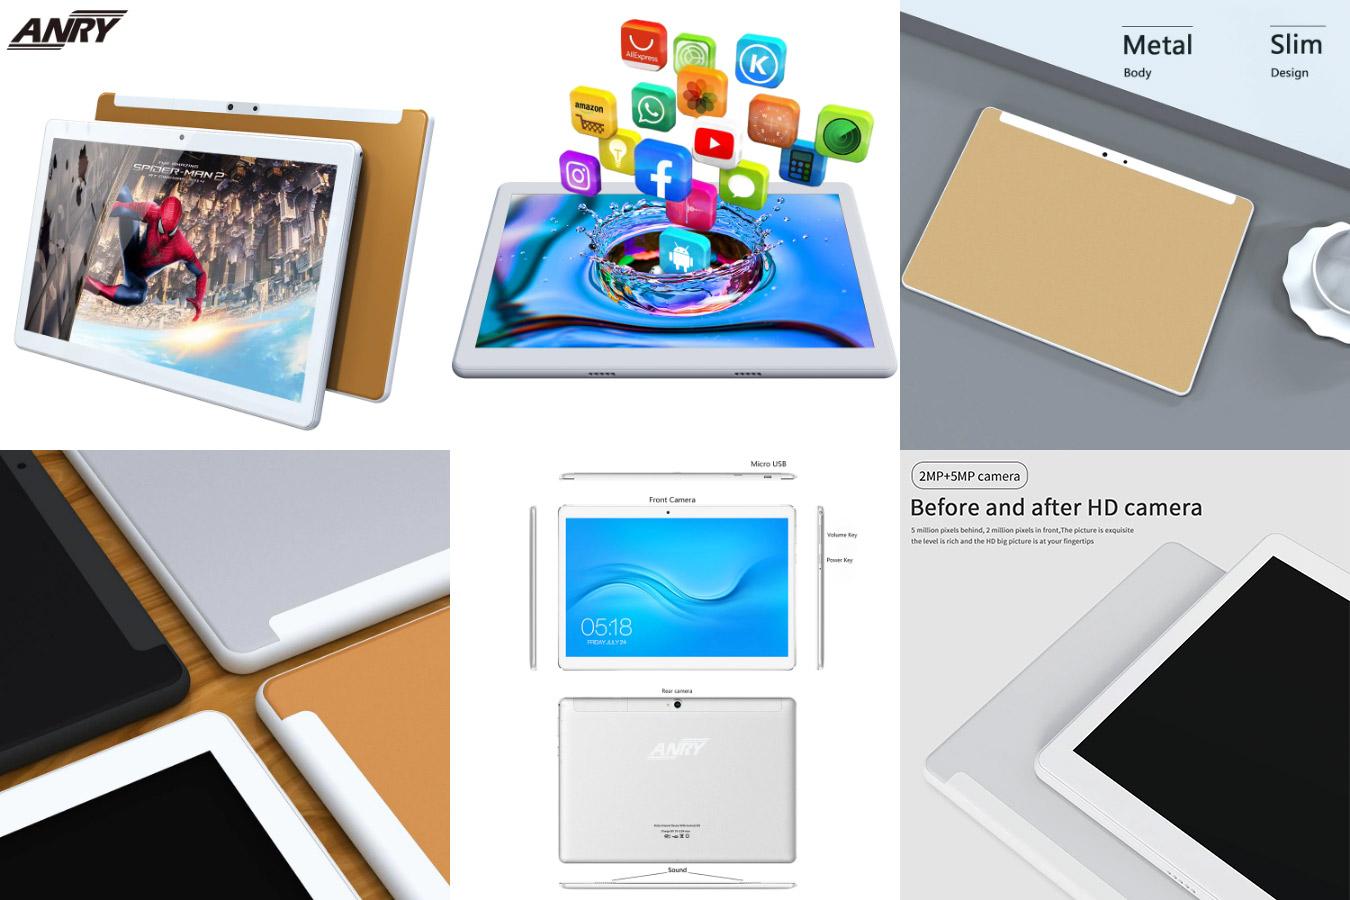 Качественный планшет ANRY 4G LTE